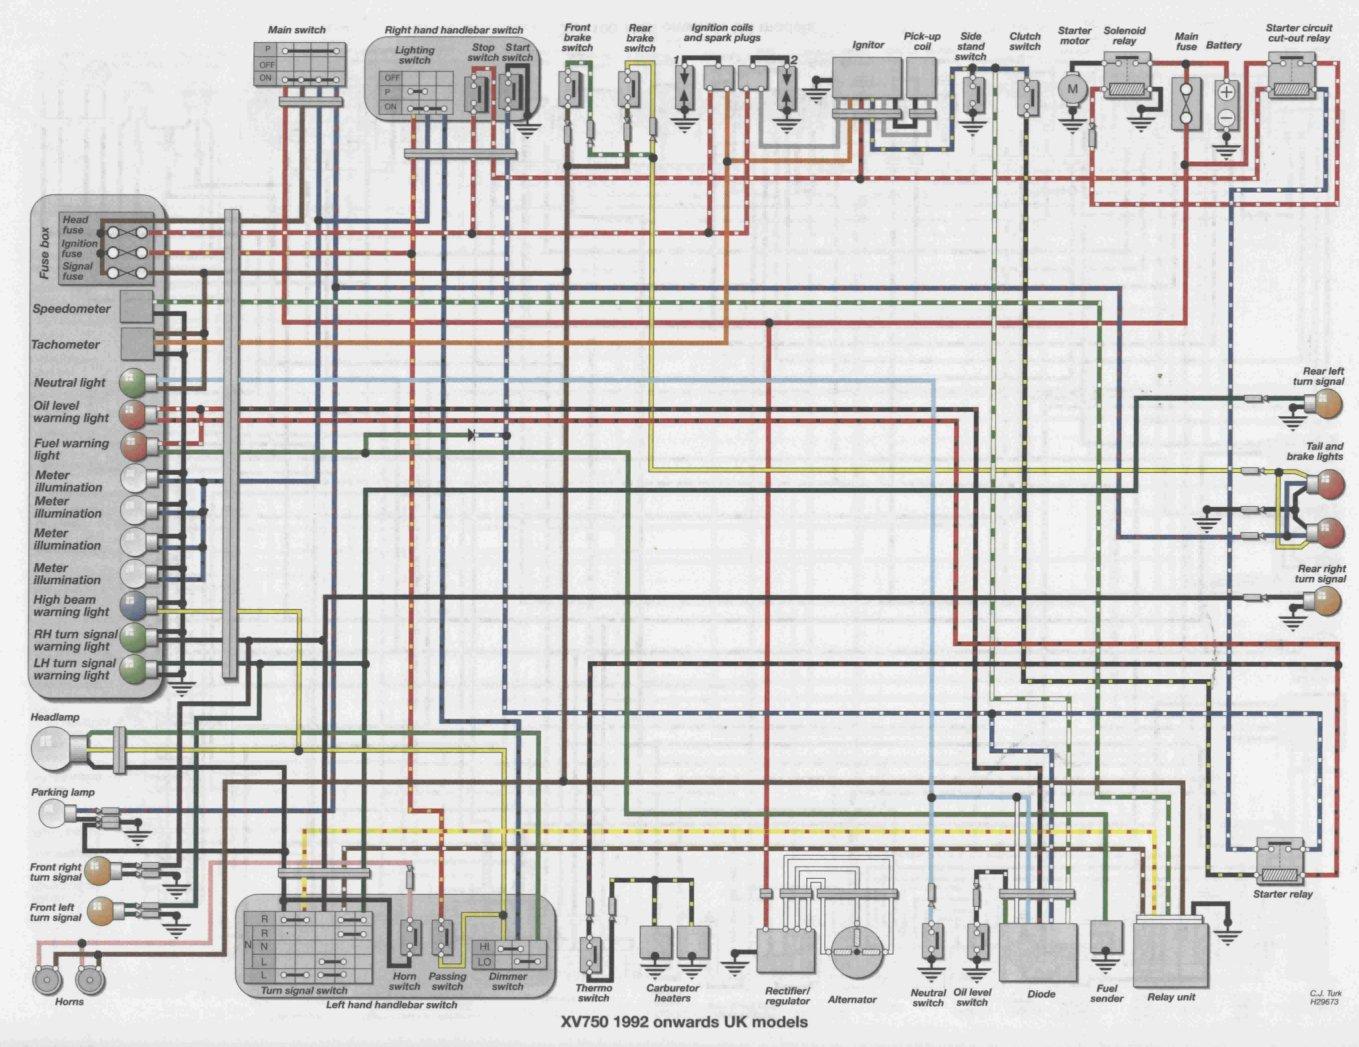 Modern 1978 Yamaha Xs650 Wiring Diagram Frieze - Wiring Diagram ...